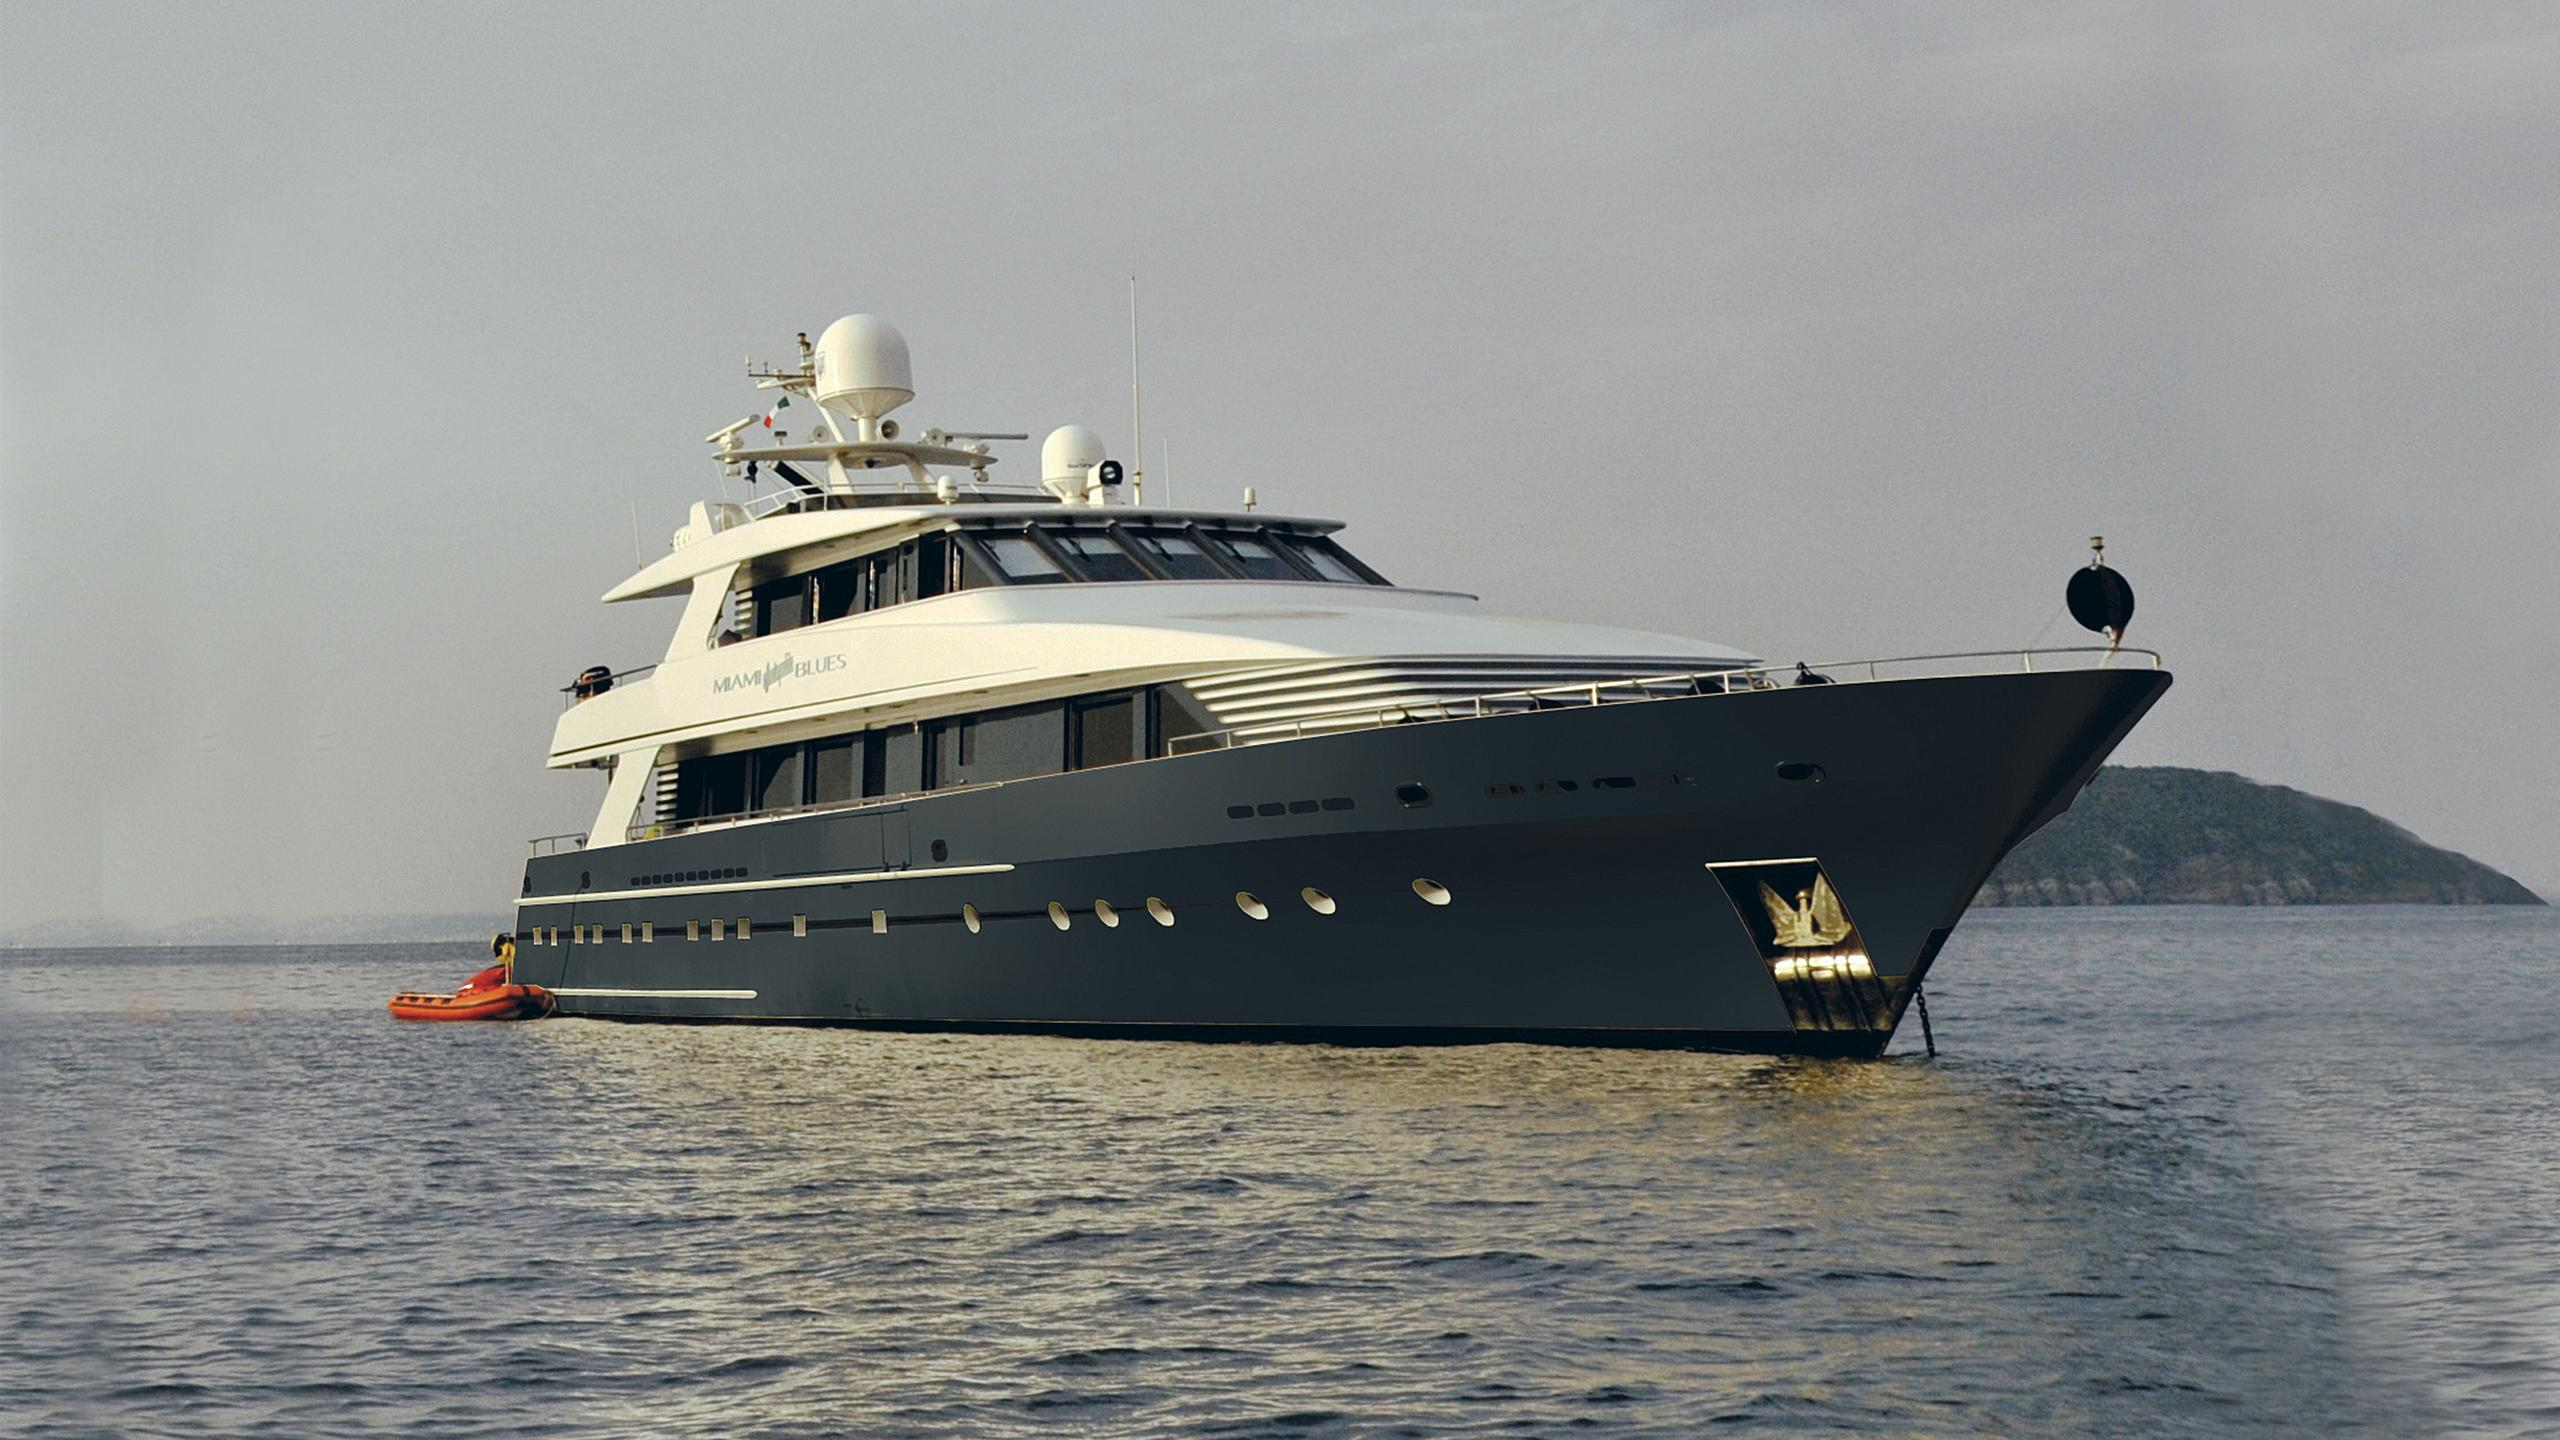 miami-blues-yacht-at-anchor